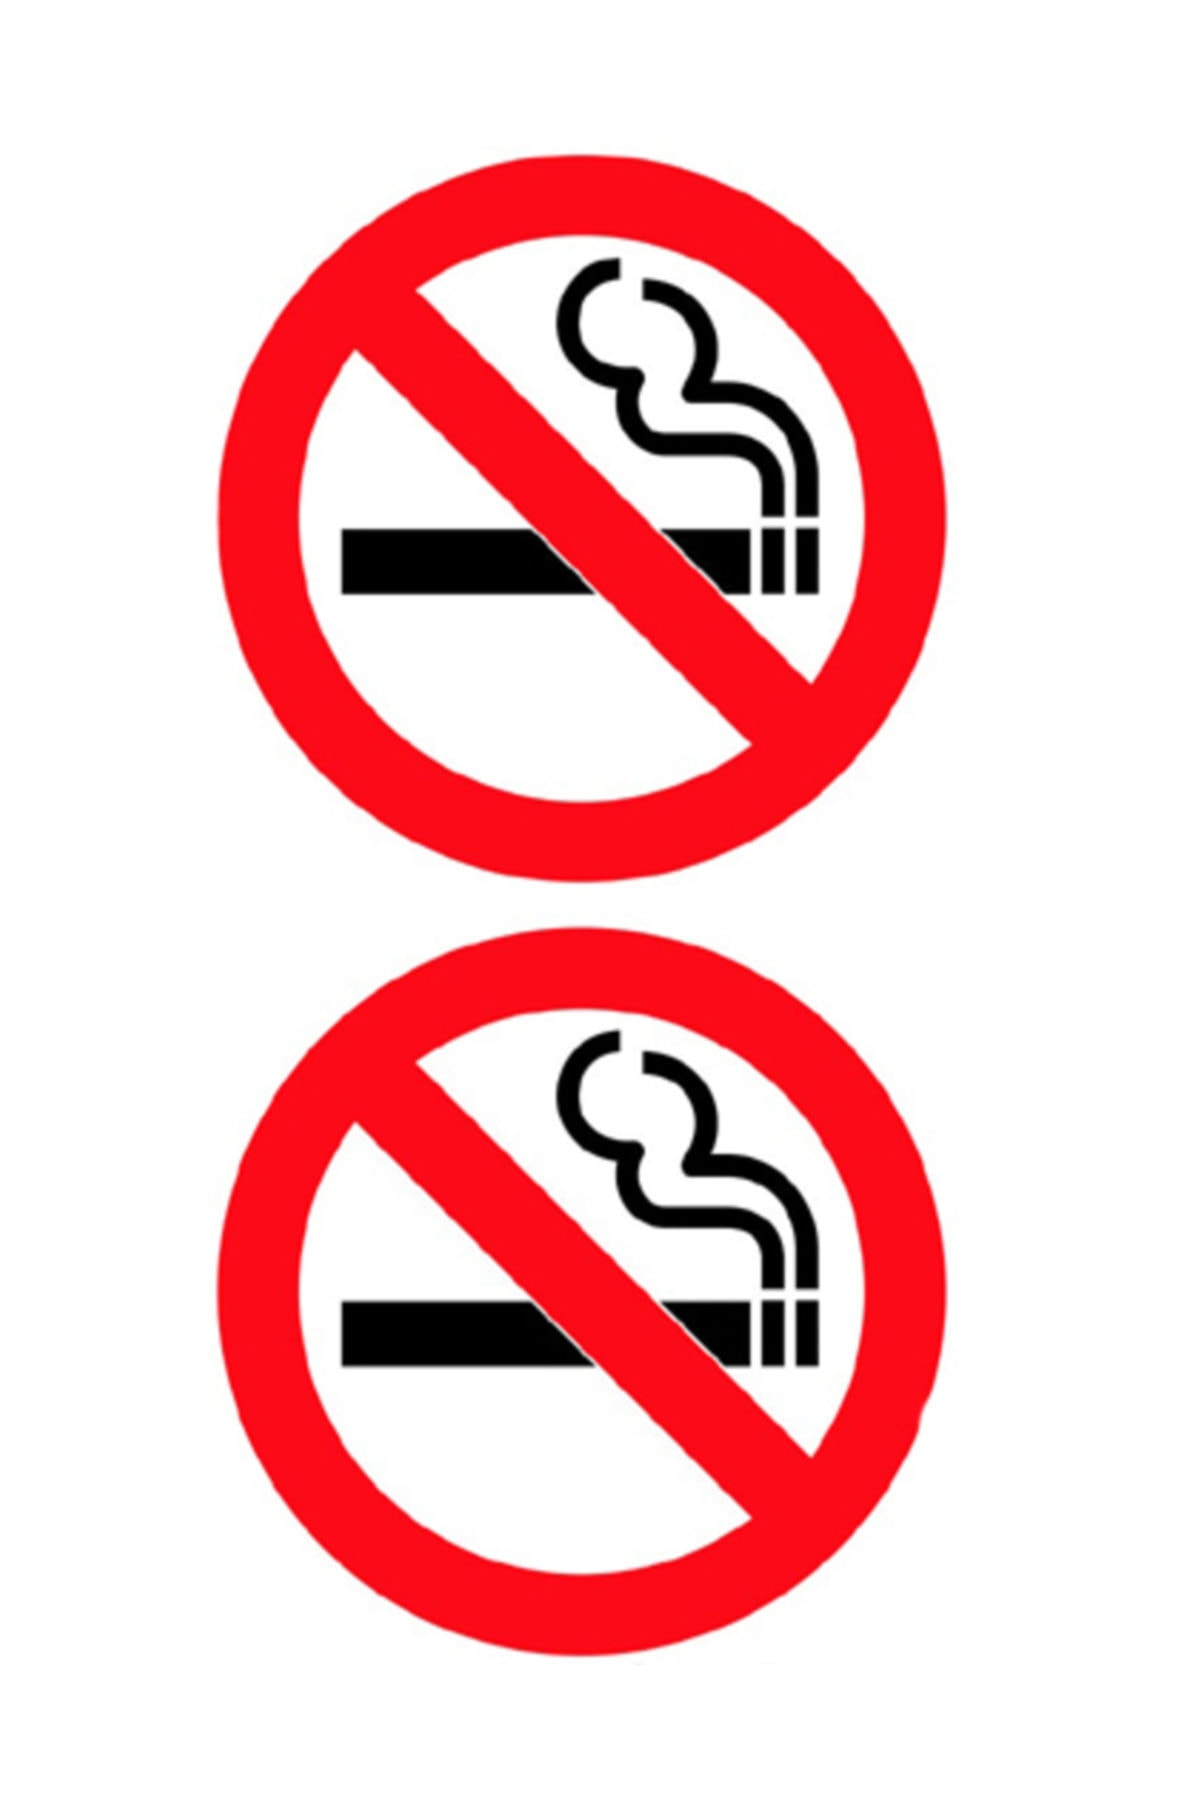 Automix Sigara İçilmez Sticker Damla Çıkartma-Etiket 3D 2 Ad 1